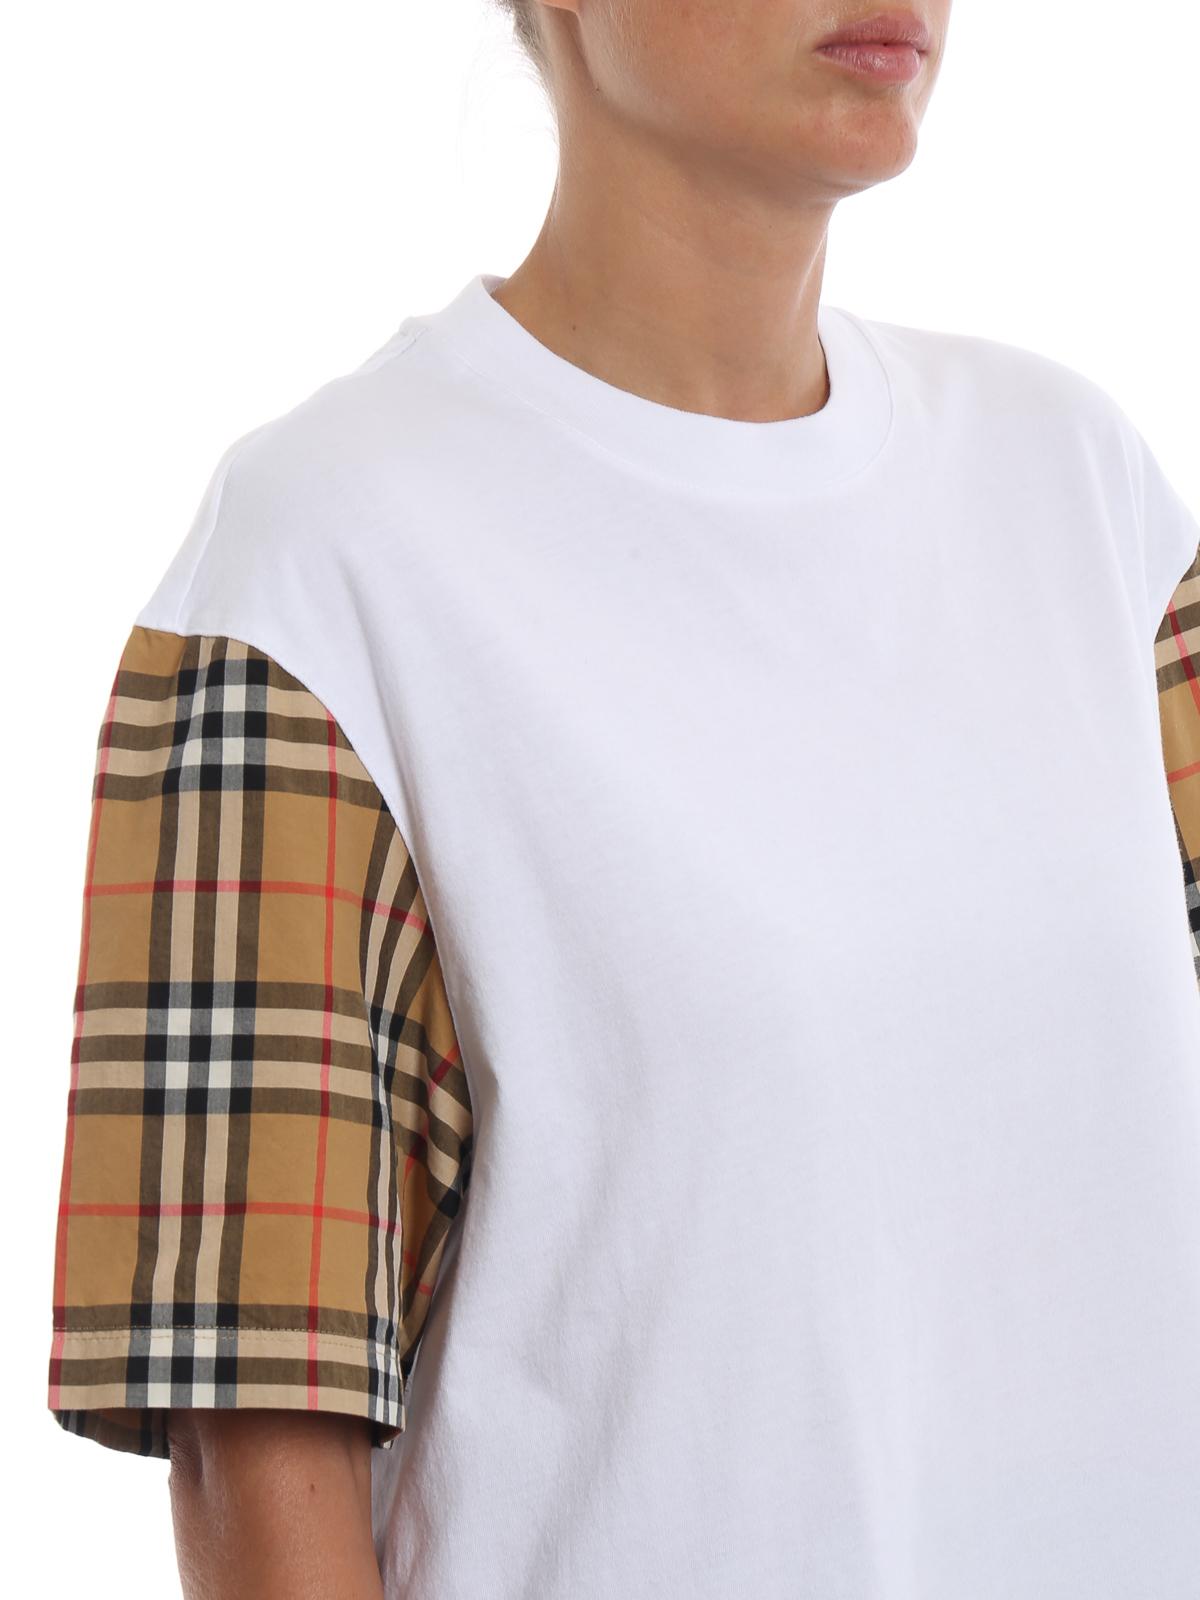 c2a5dbfc676f Burberry - Serra vintage check sleeve white cotton Tee - t-shirts ...